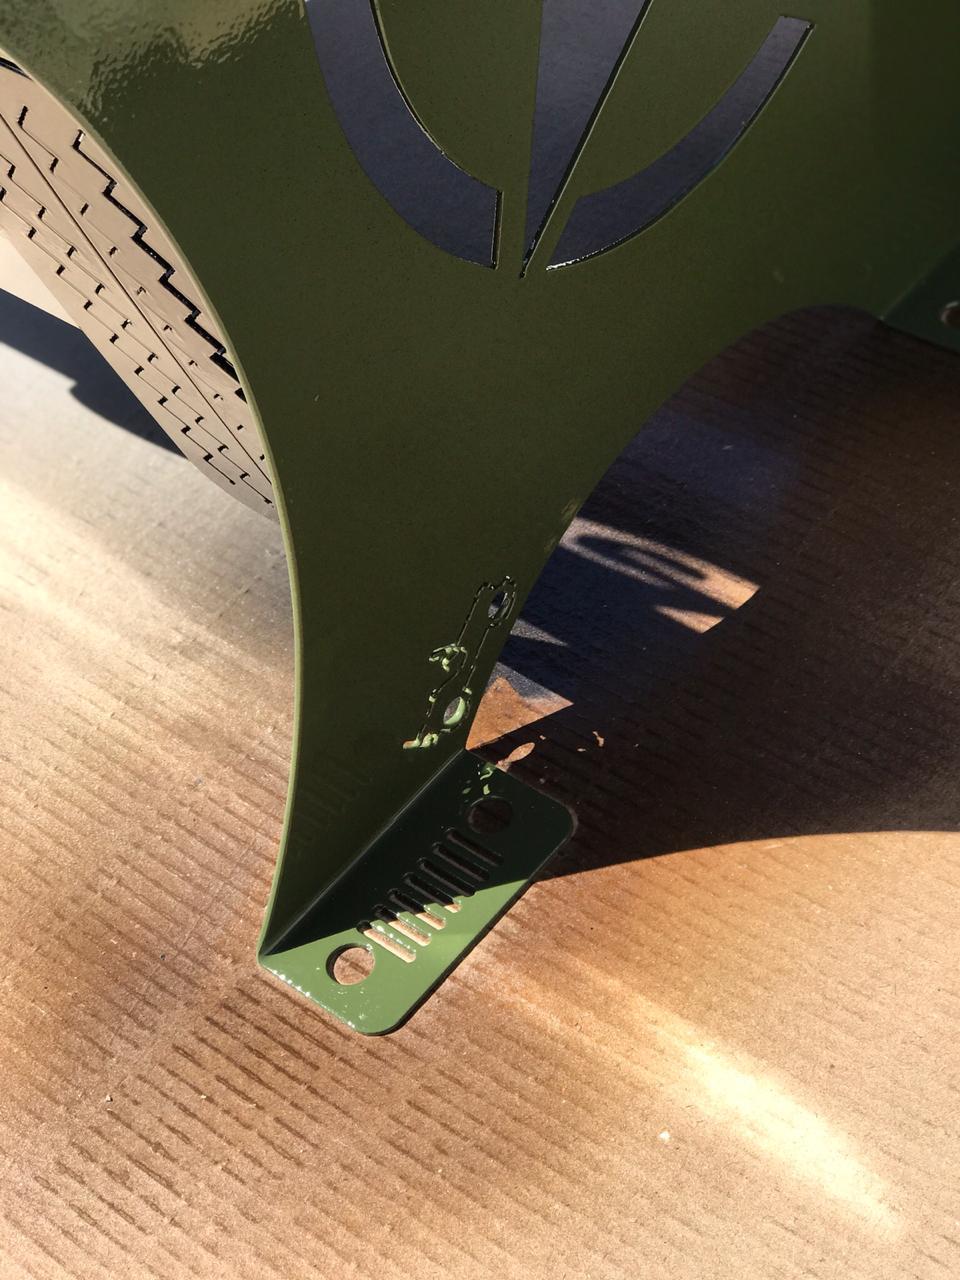 Poltrona JEEP 0,70 m Verde Militar  - HDC Brasil